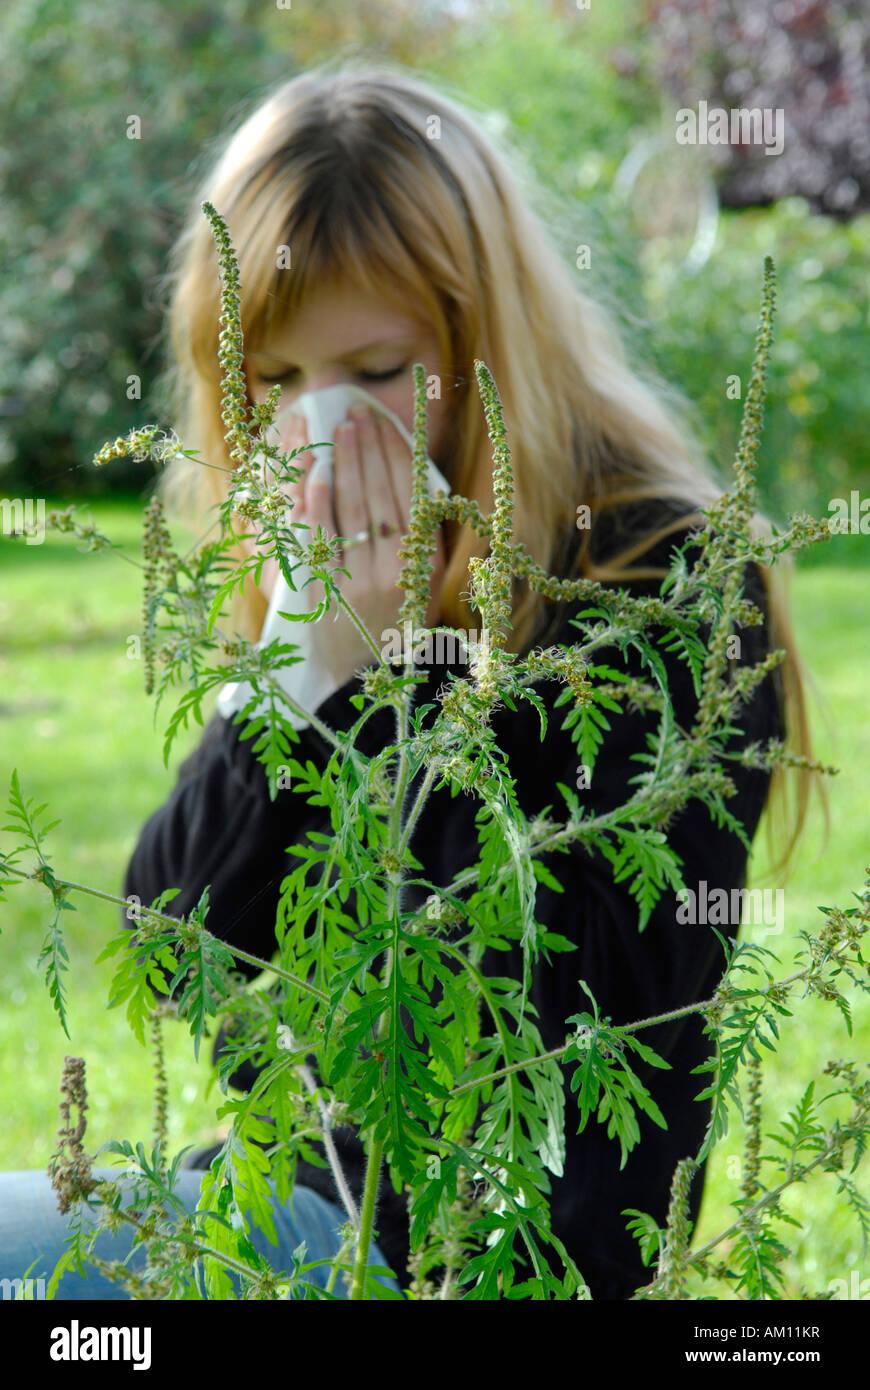 Woman reacting allergic to Ragweed Stock Photo